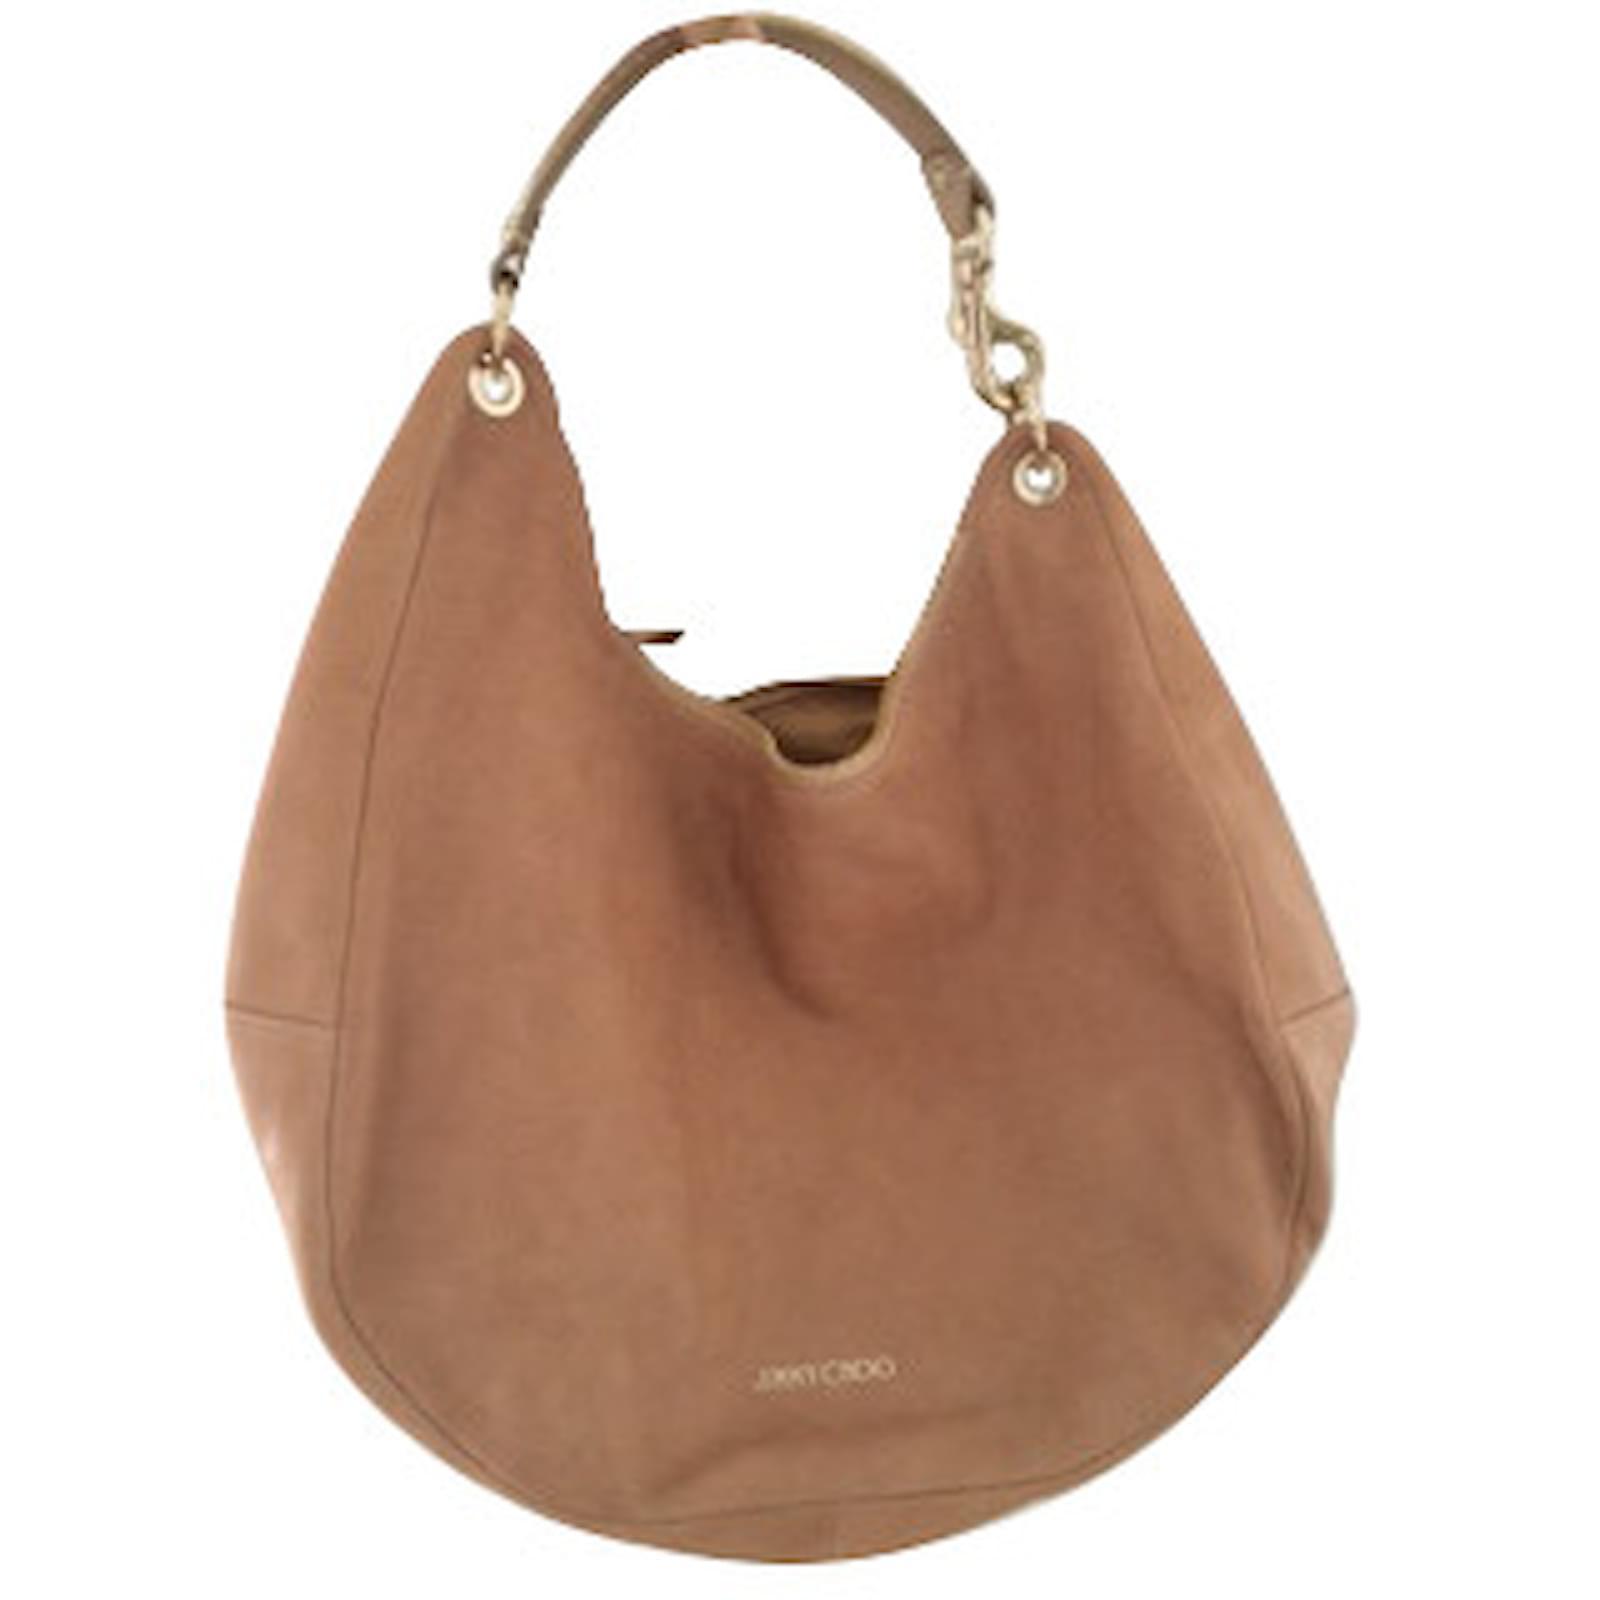 8c9000a60b Jimmy Choo Handbags Handbags Leather Beige ref.6644 - Joli Closet